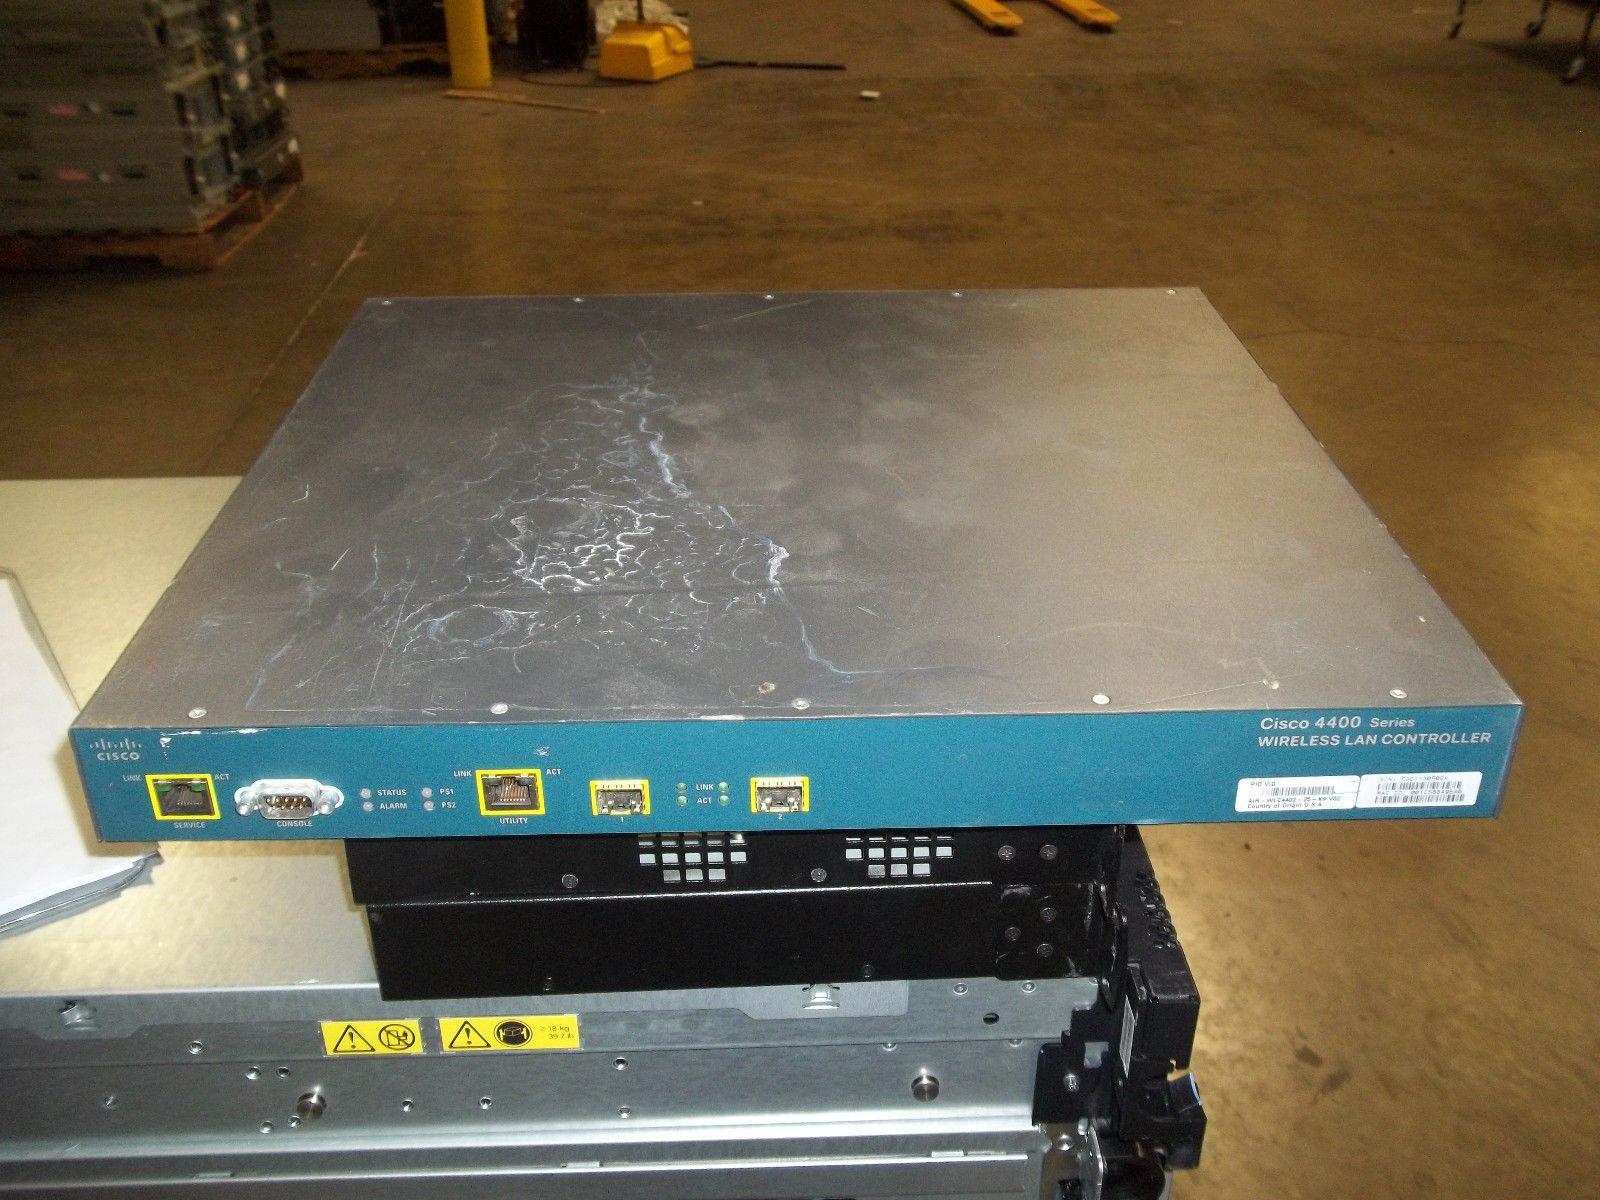 AIR-WLC4402 Cisco Wireless LAN Controller 4400 2-Port Gigabit Router